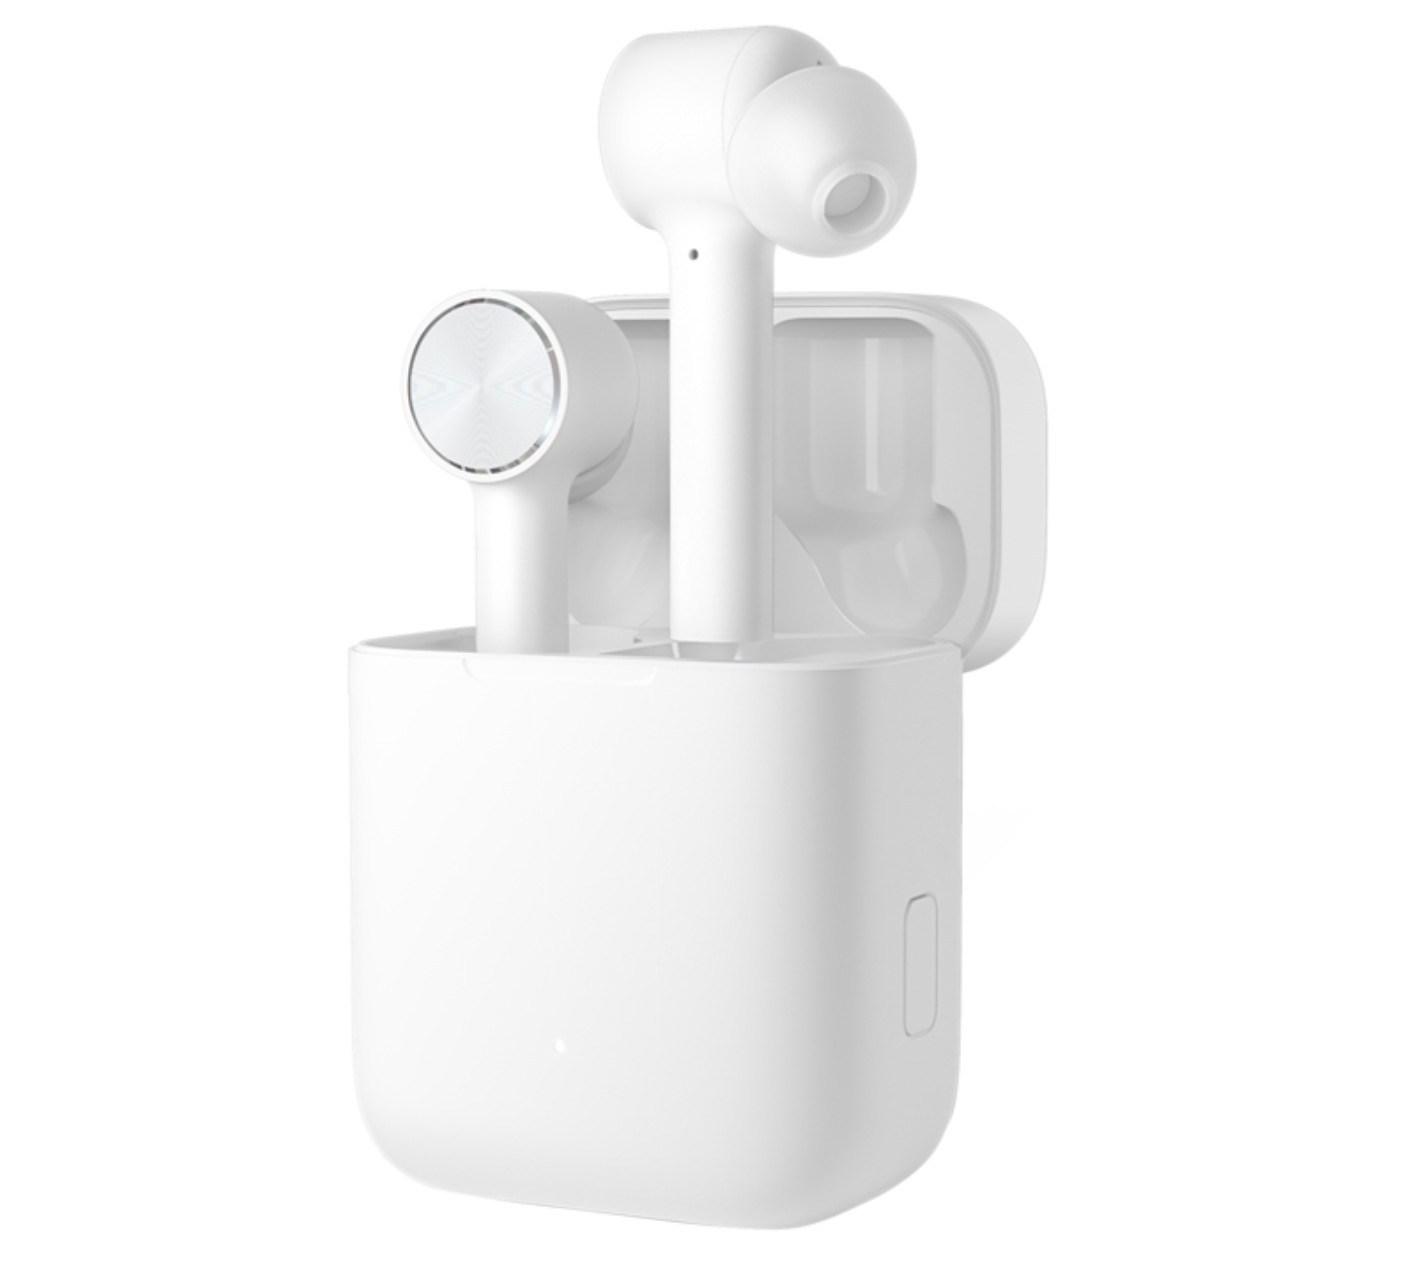 1f9681a2407 Xiaomi Mi Airdots Pro TWS Bluetooth Wireless Earphones for $84.50 +  Shipping $87.9